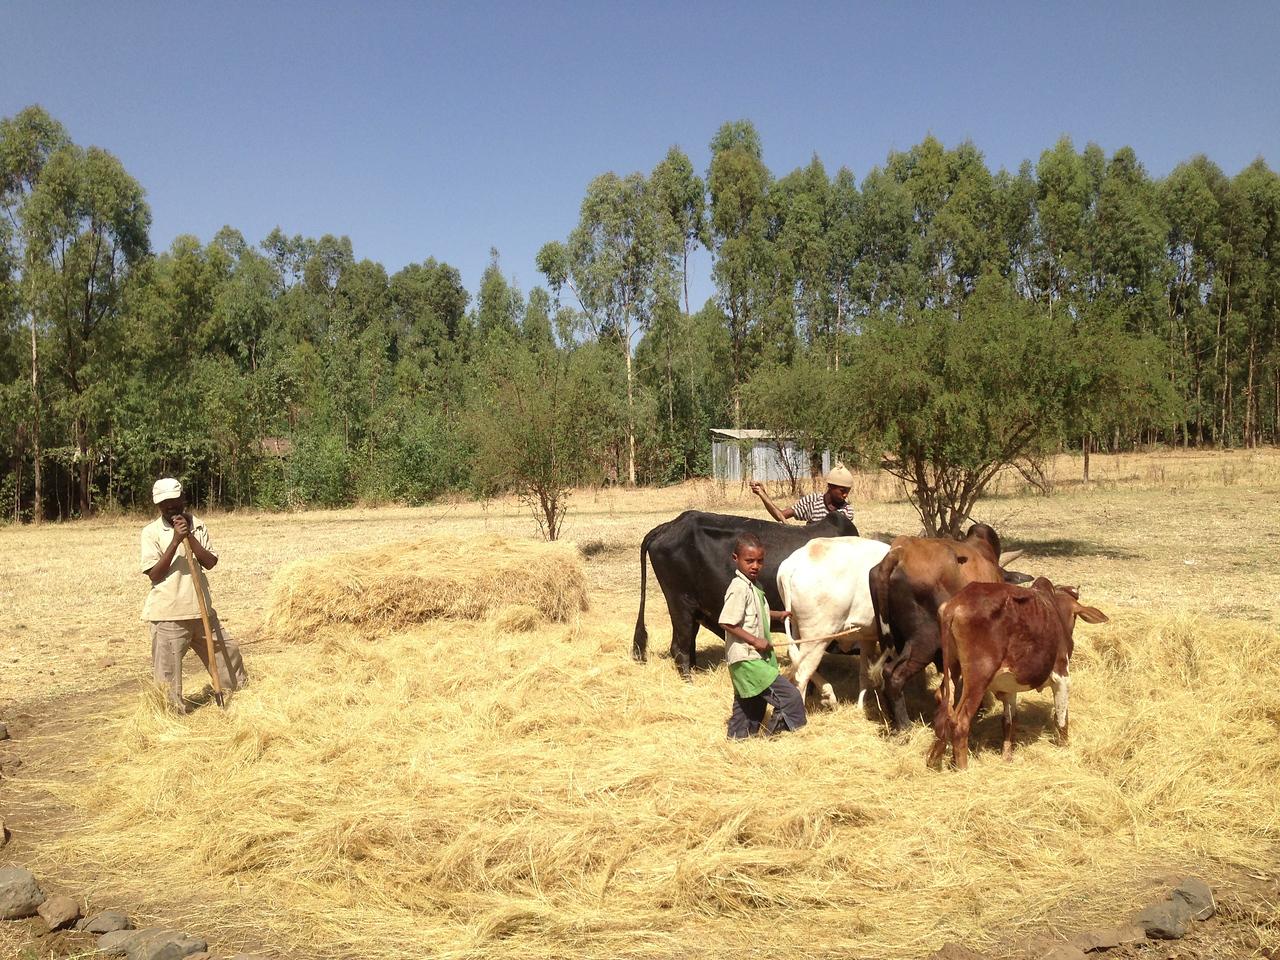 Farmers using cattle to thresh teff